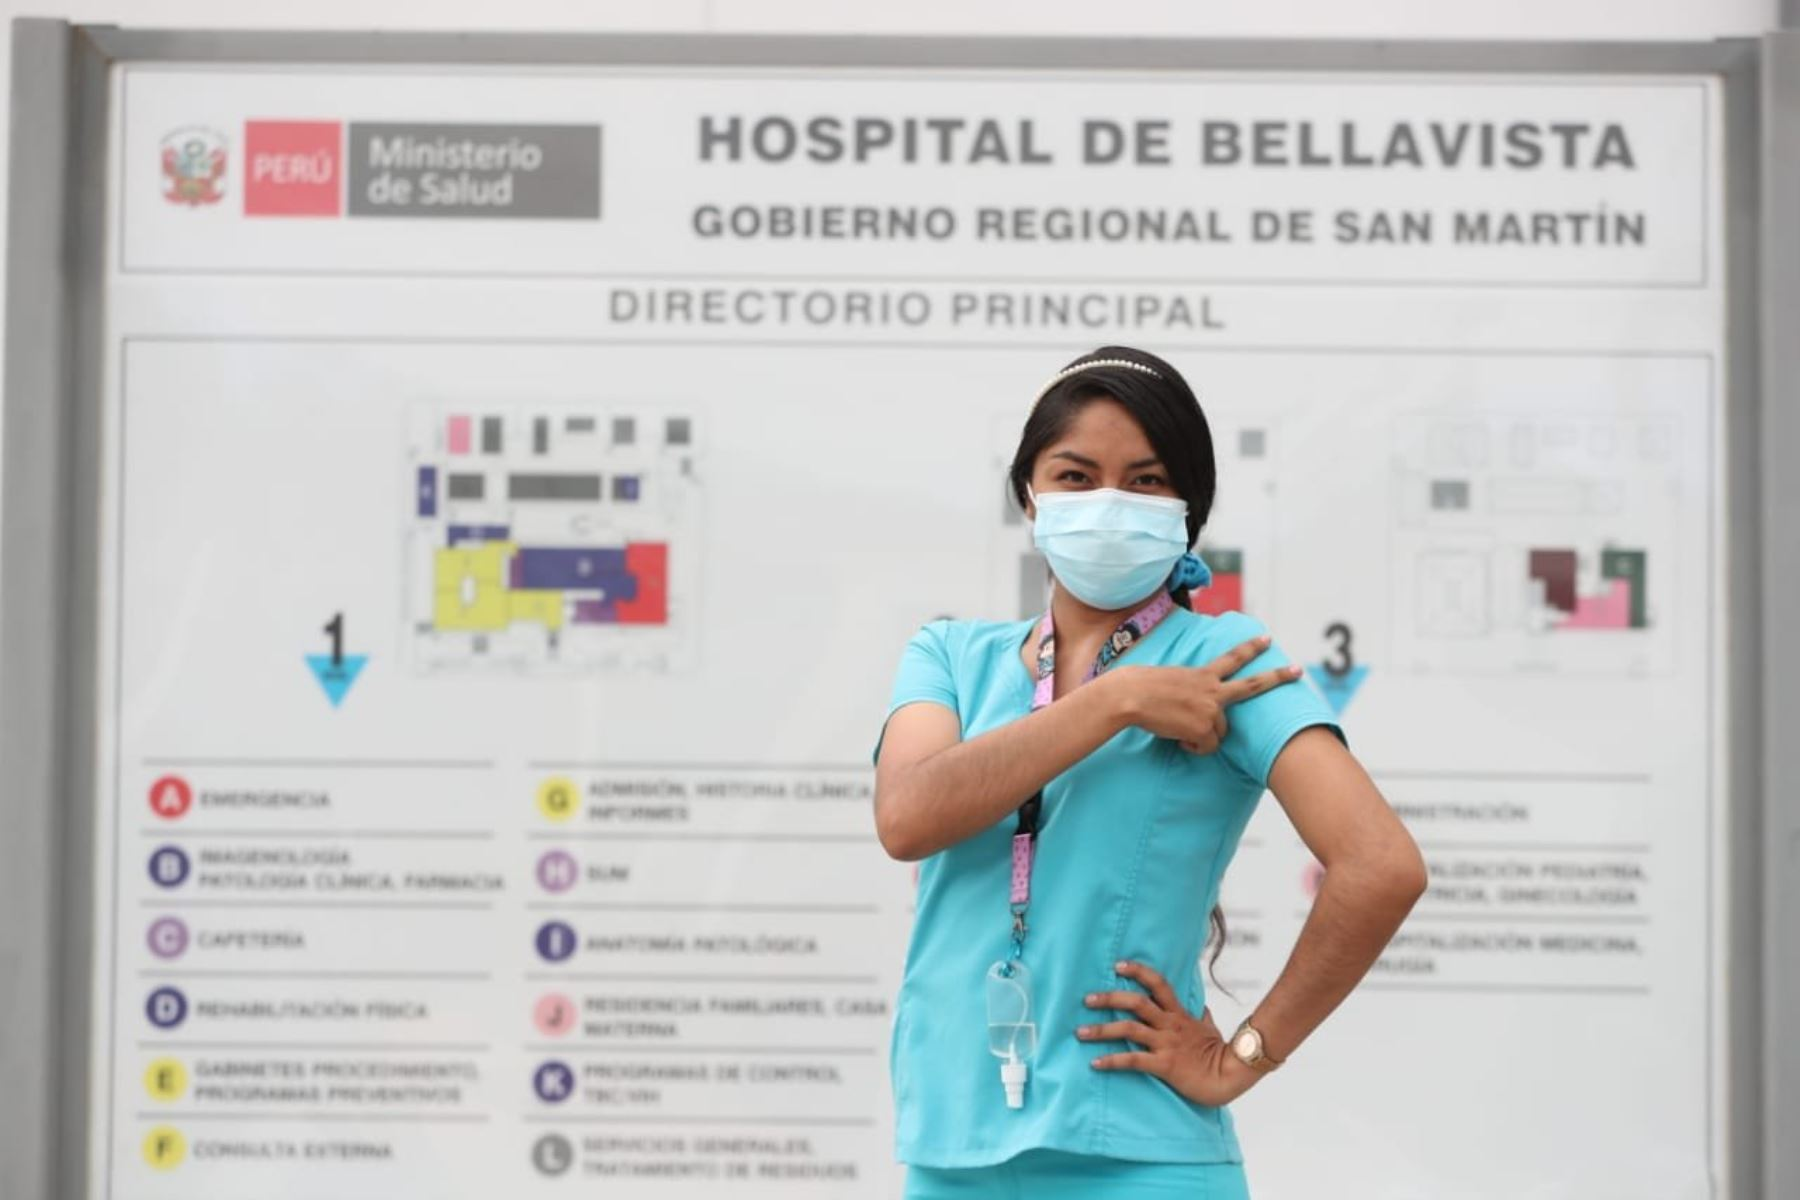 El hospital de Bellavista (San Martín) demandó una inversión de 117 millones 408,455 soles. Foto: ANDINA/Goresam